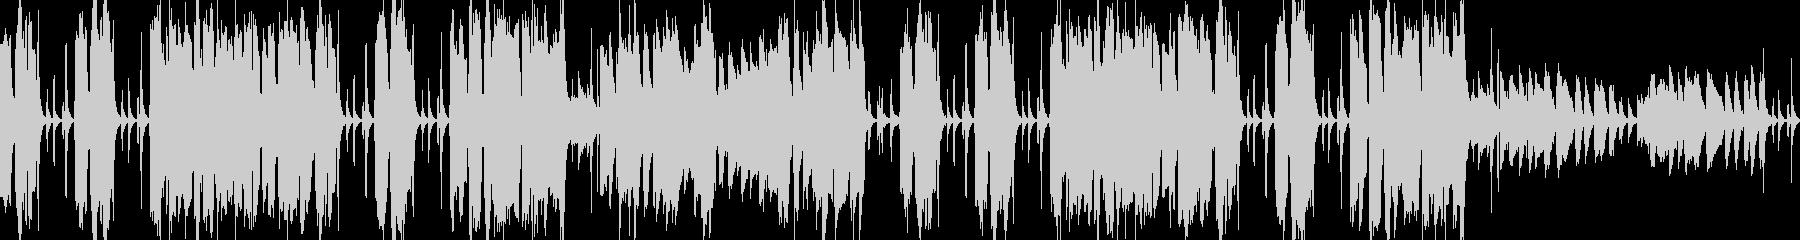 CMループ曲 軽やかマレット&クラップの未再生の波形